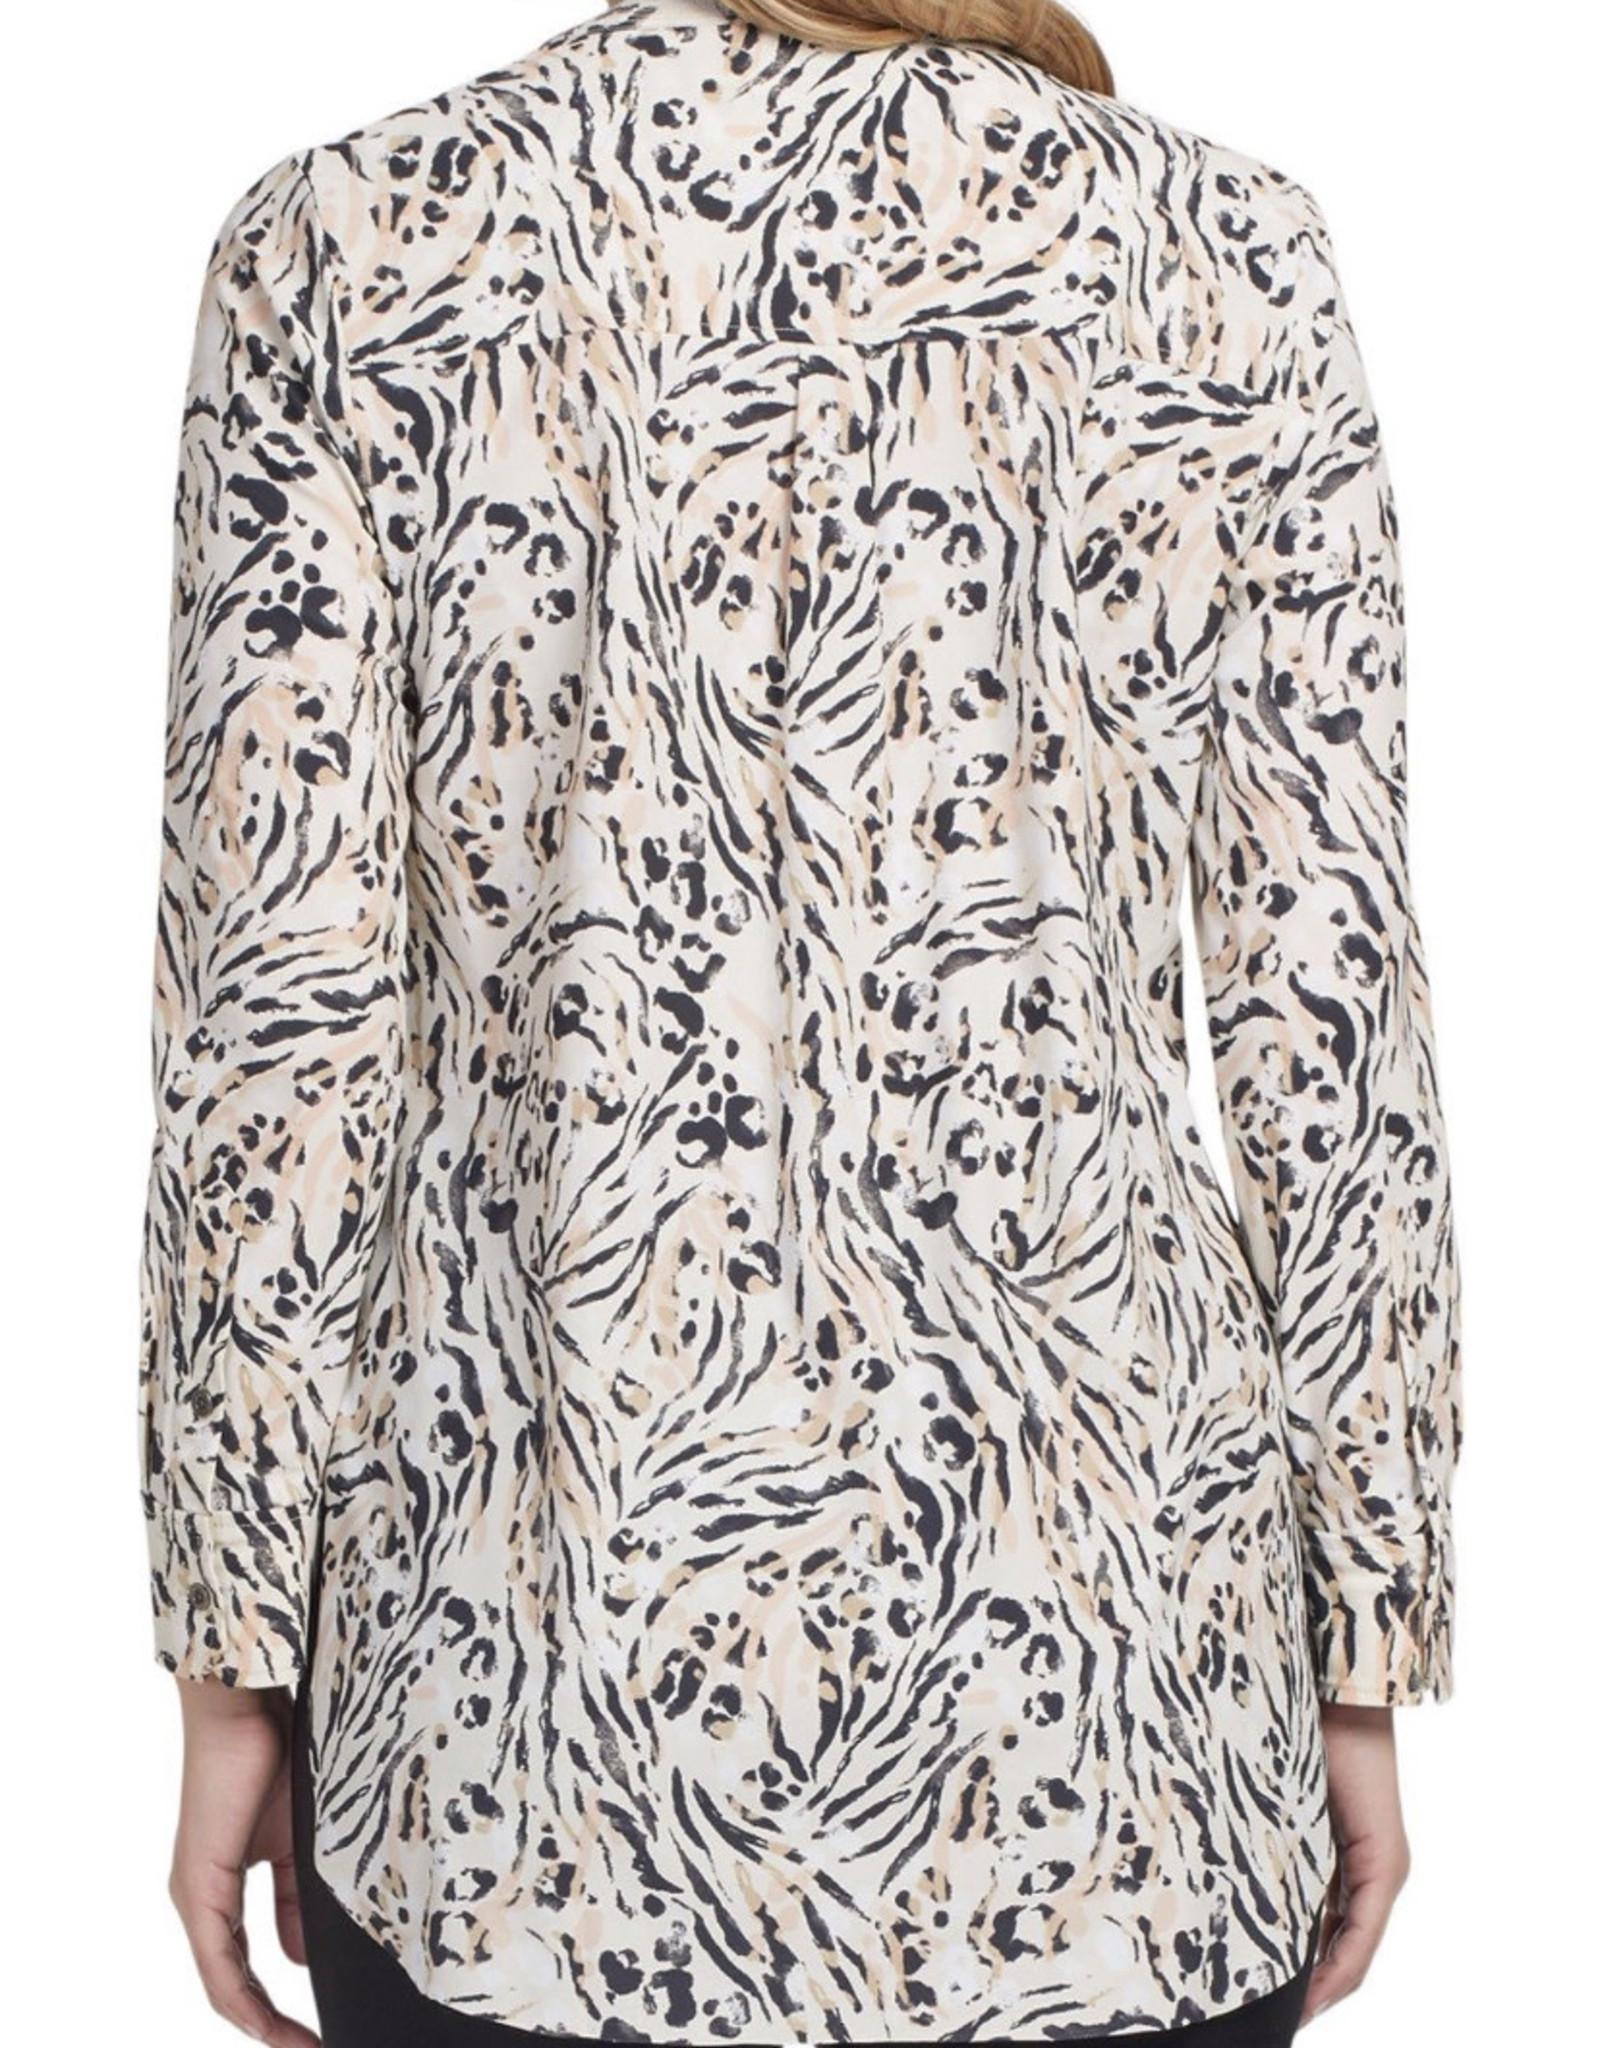 L/s blouse Sandstone